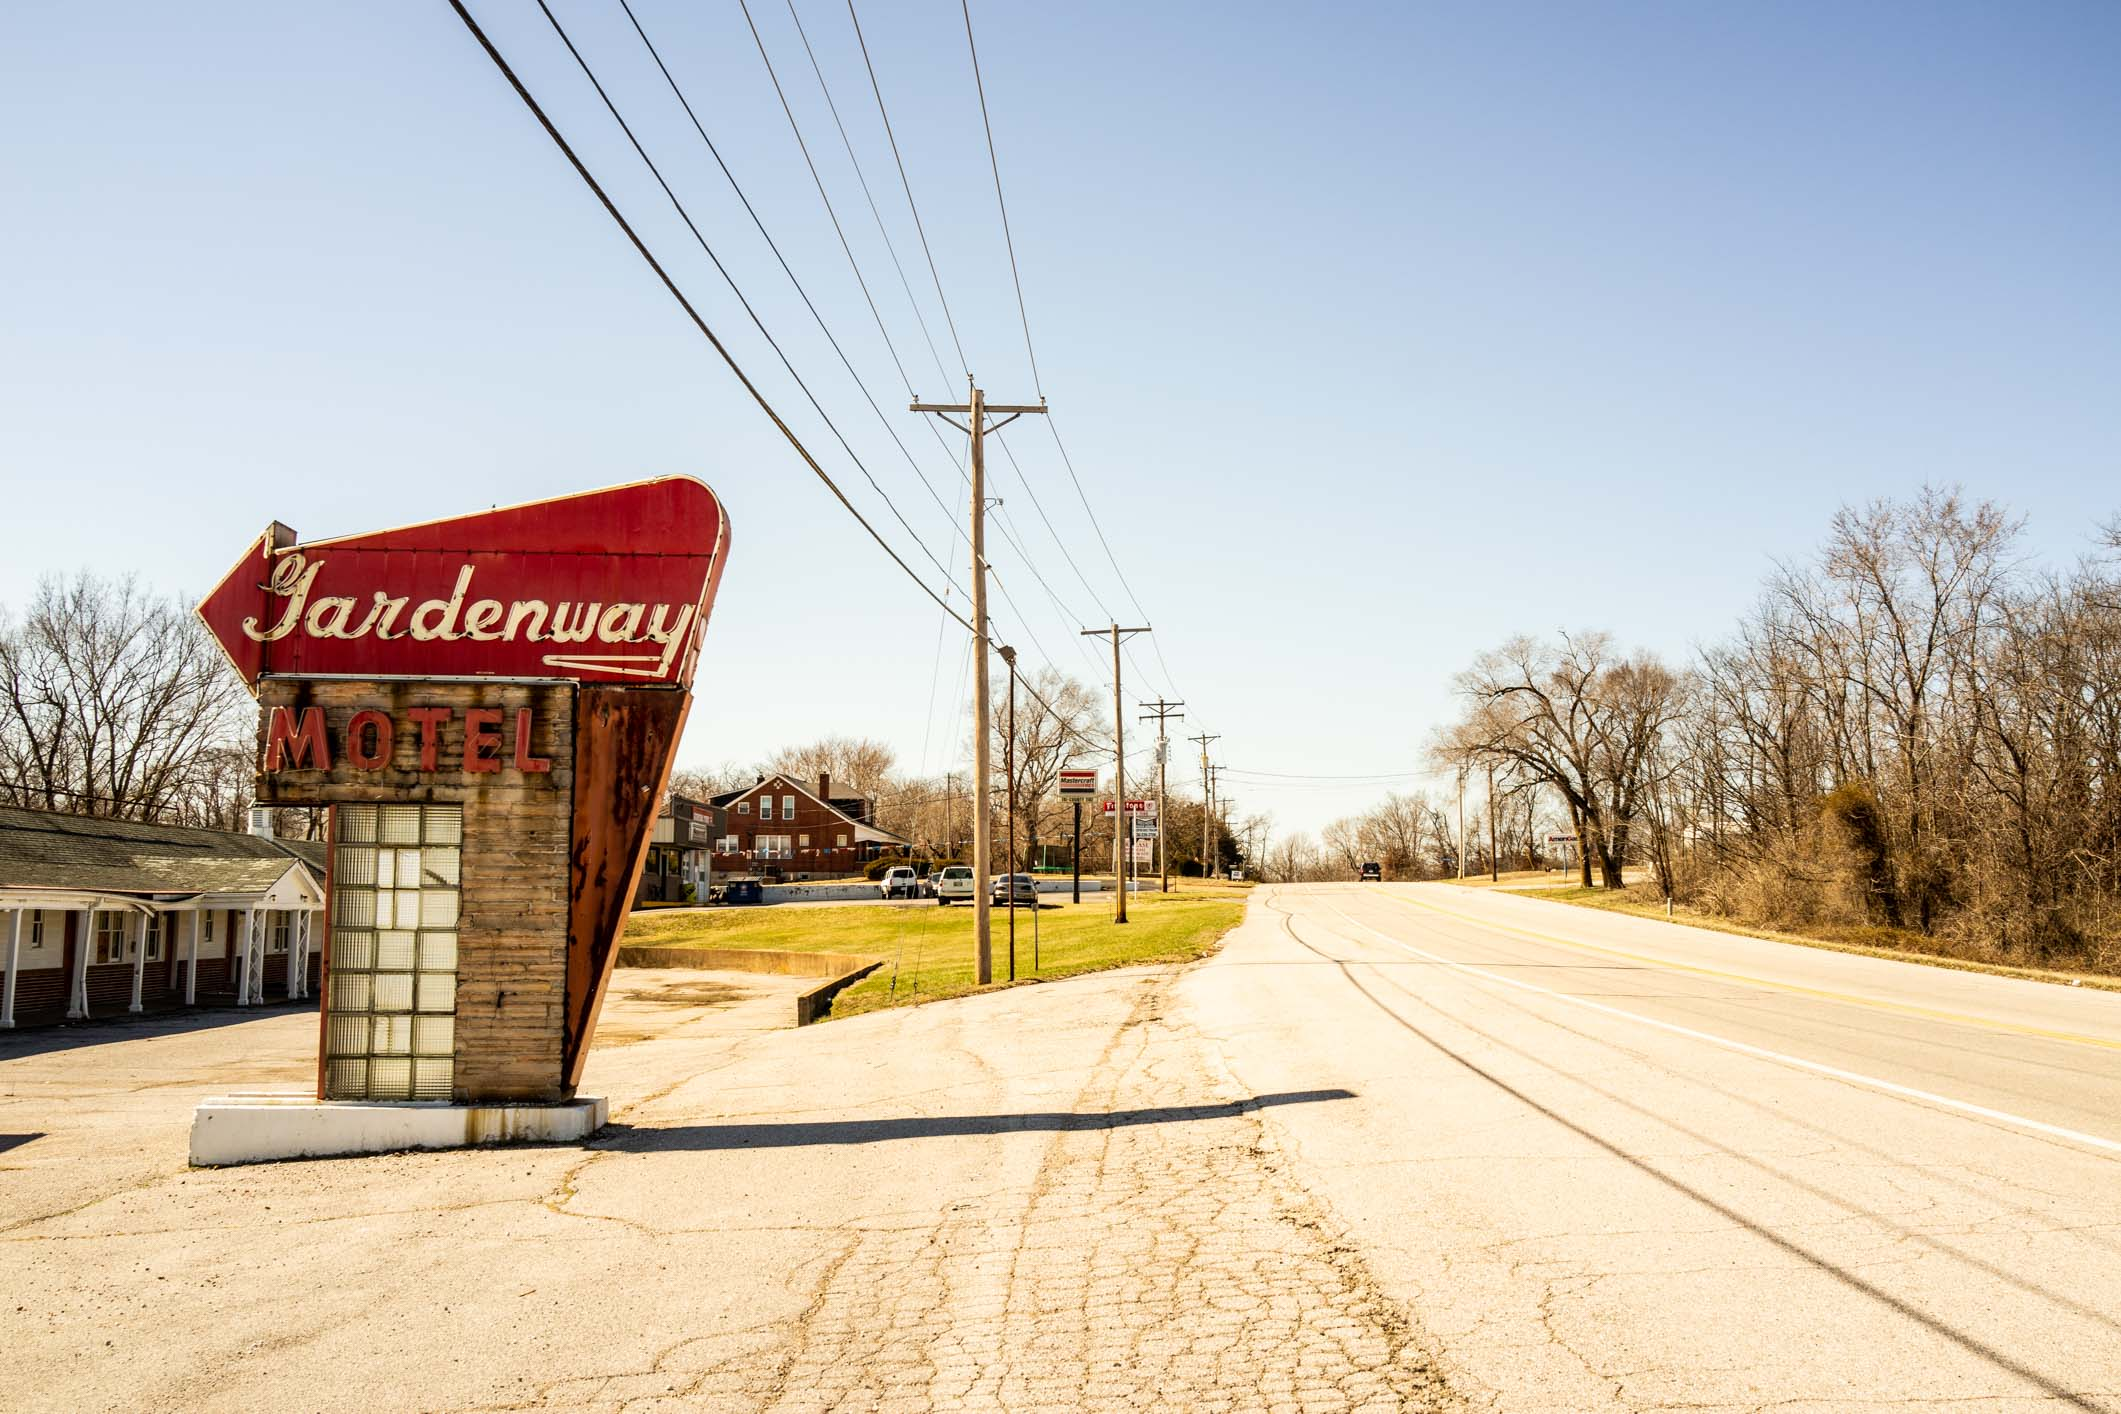 Jardenway Motel